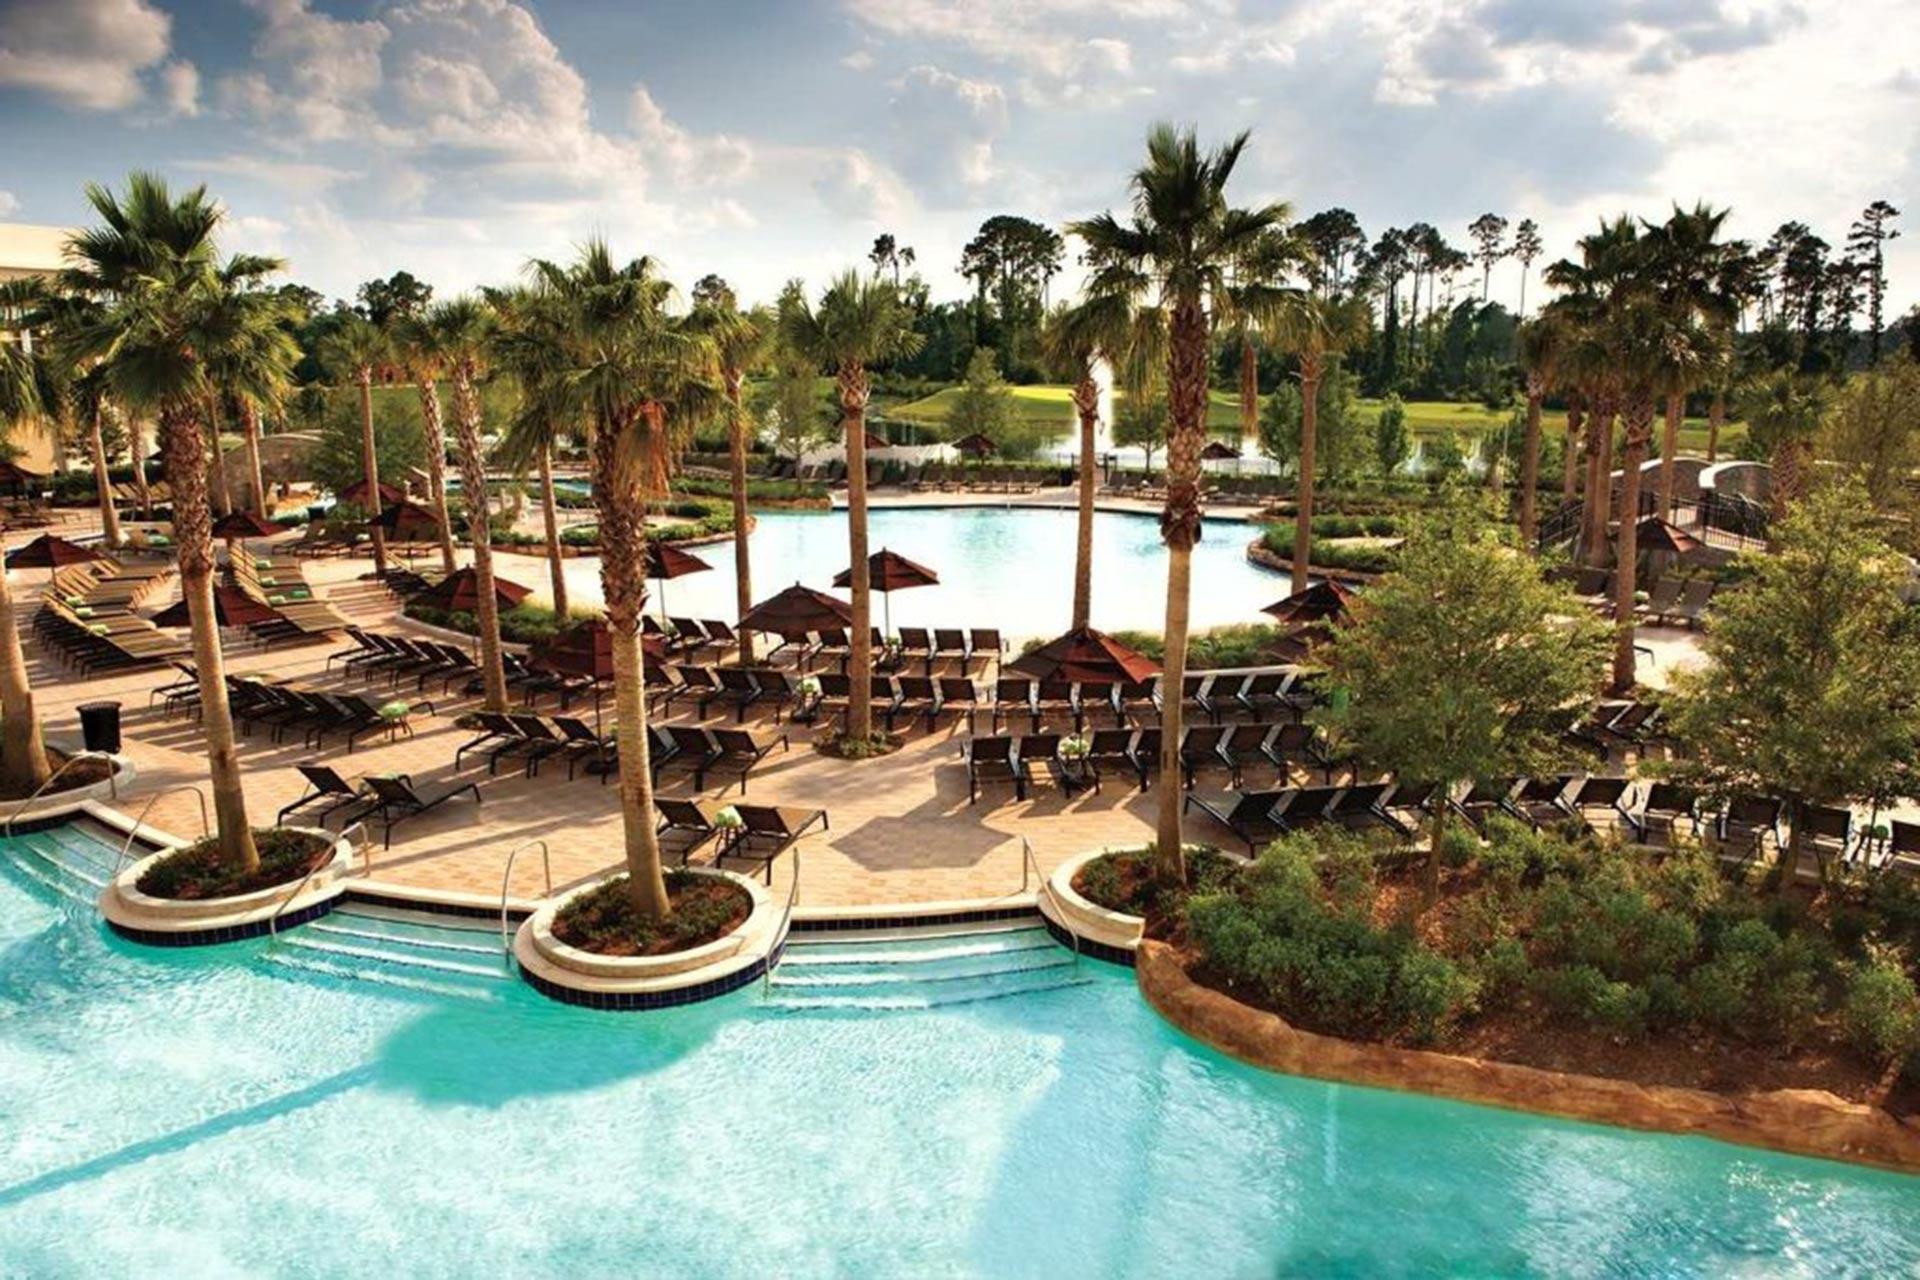 The pool at Hilton Orlando Bonnet Creek.